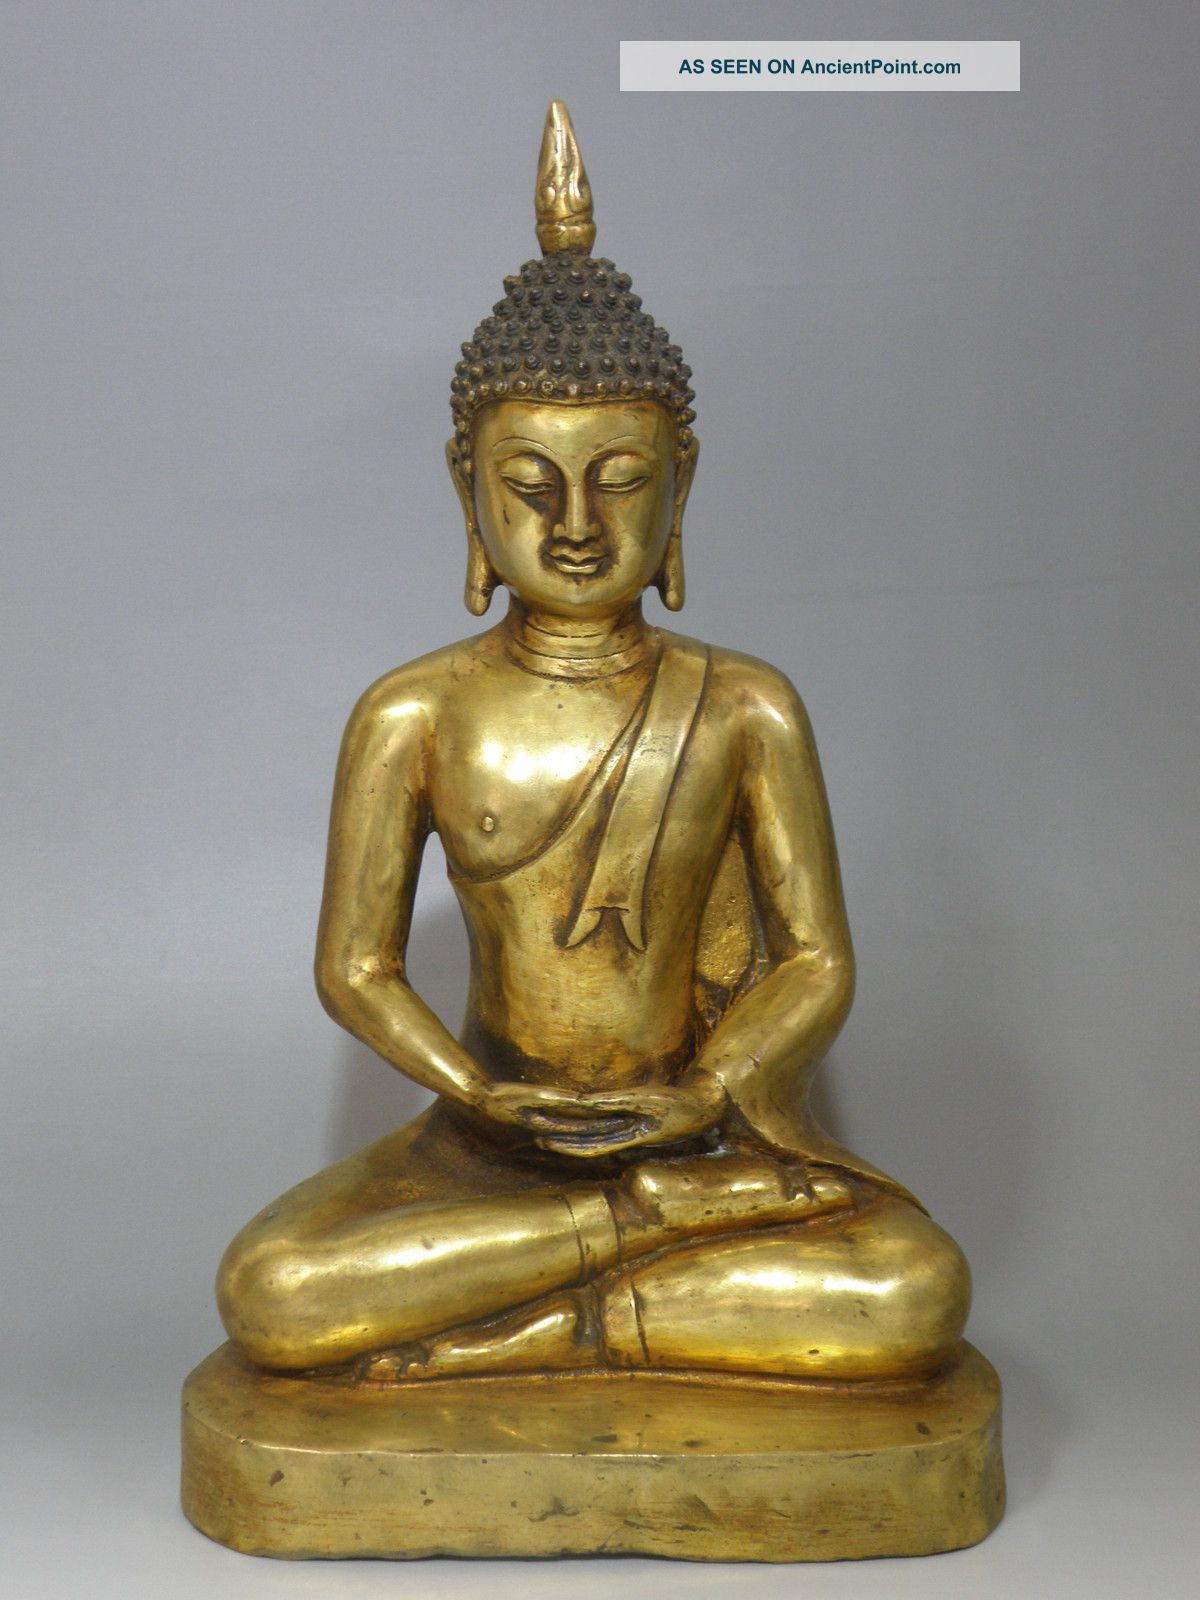 Vintage Copper Crafted Sakyamuni Statue: Seated Buddha Statue Ming Dynasty N507 Buddha photo